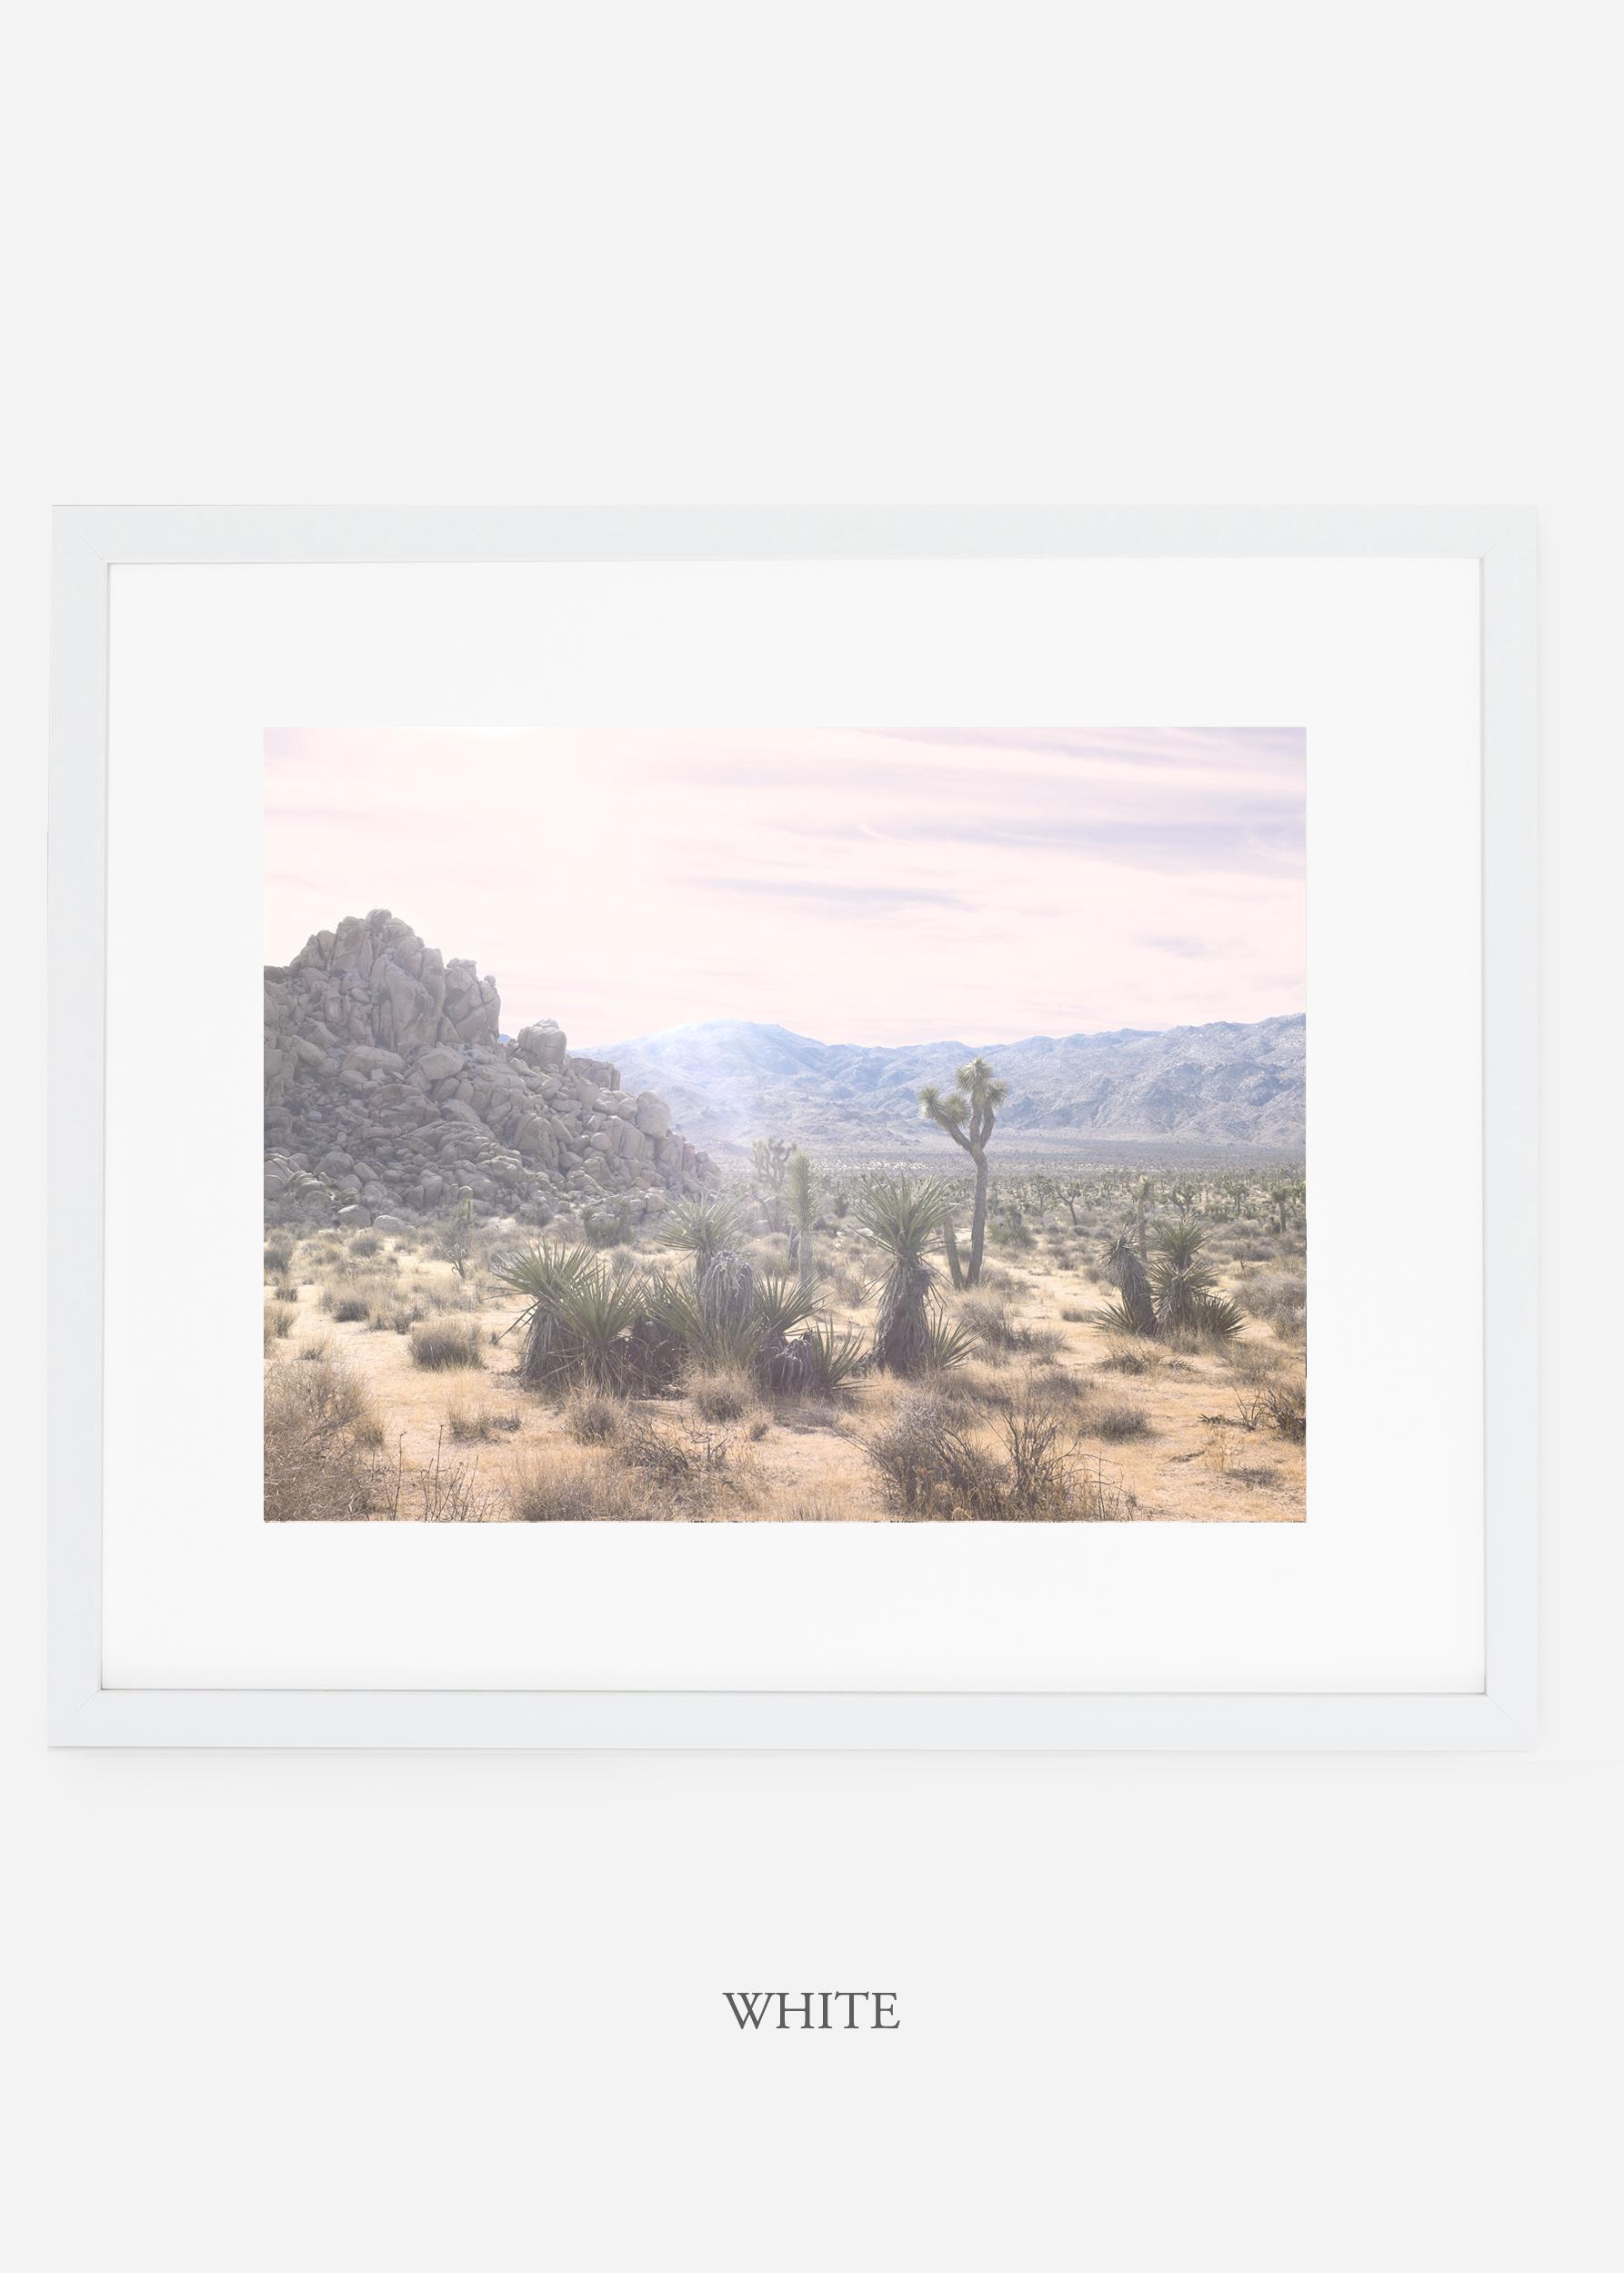 WilderCalifornia_whiteframe_JoshuaTree_No.9_interiordesign_prints_art.jpg